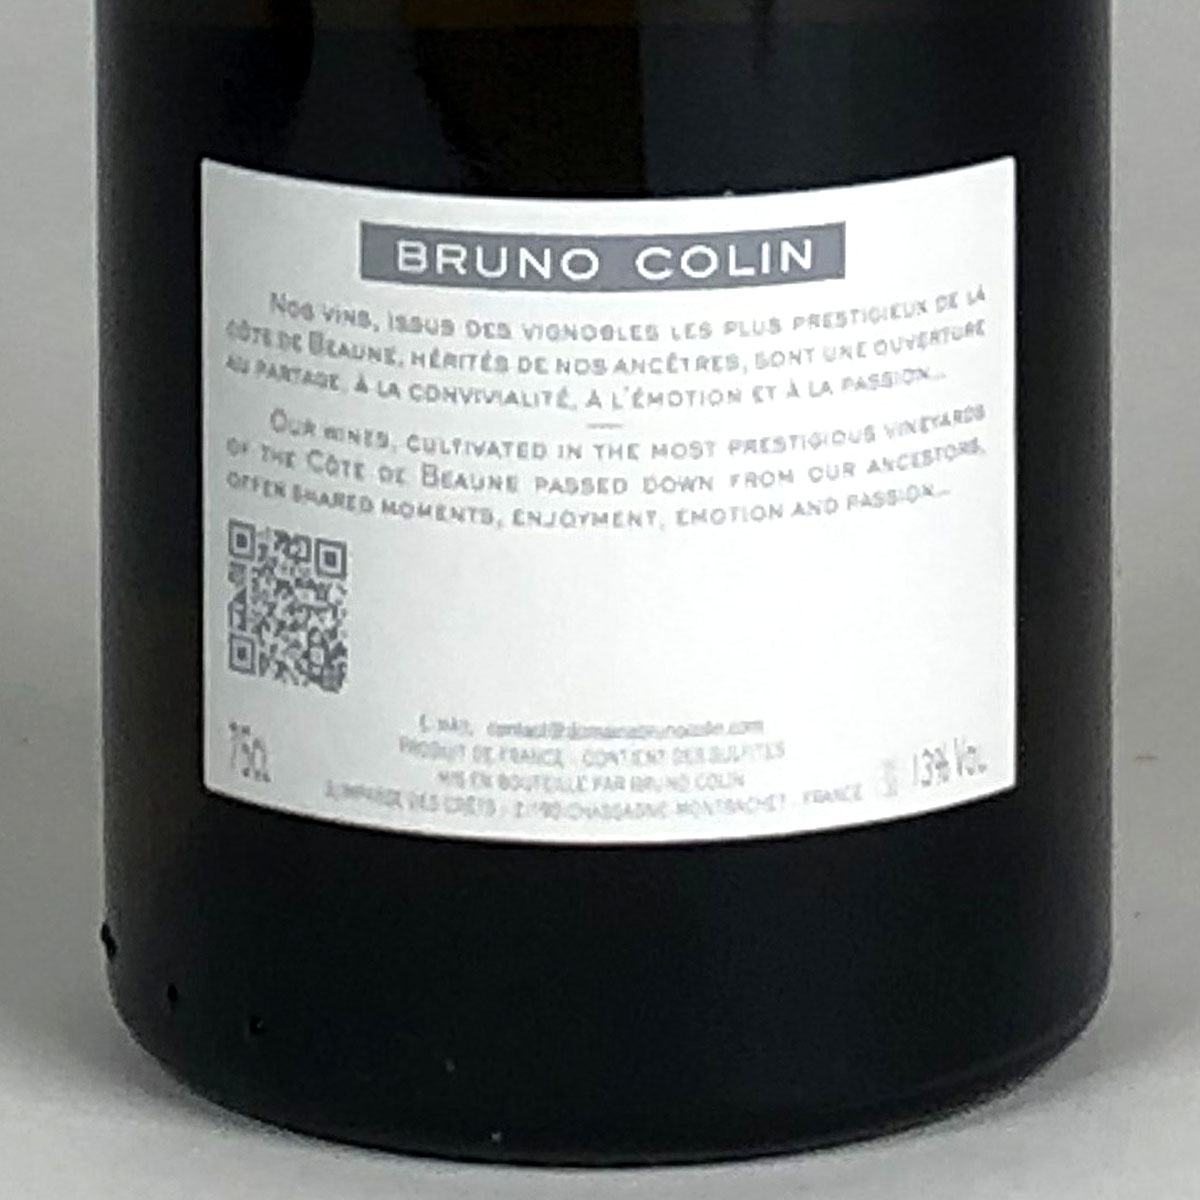 Chassagne-Montrachet: Domaine Bruno Colin 2018 - Bottle Rear Label